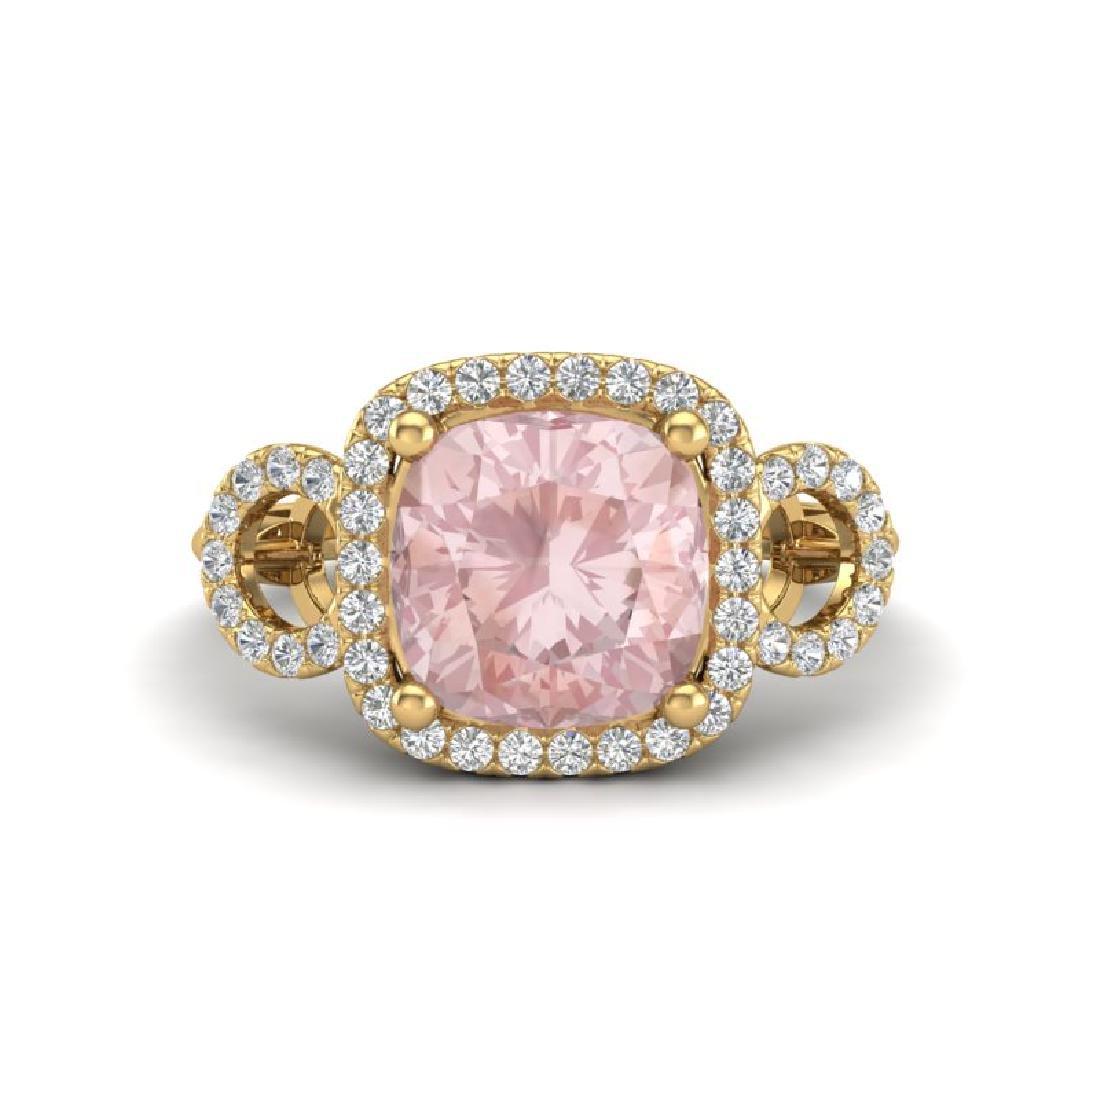 2.75 CTW Morganite & Micro VS/SI Diamond Ring 14K Rose